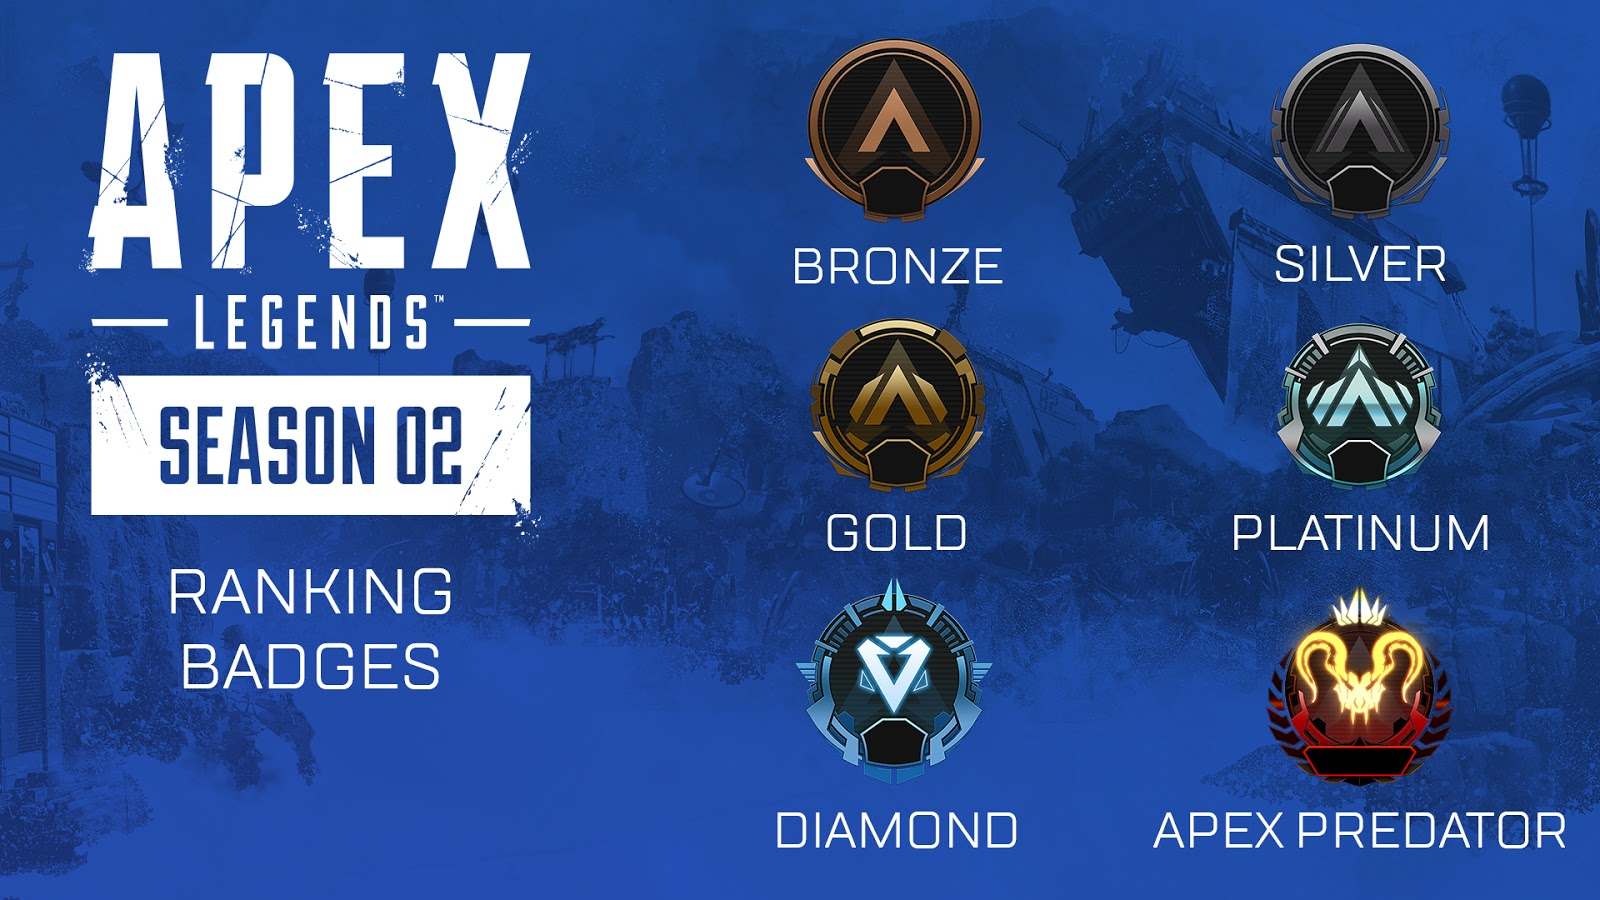 【Apex Legends】同じランクなのにマッチングできないときの対処法【ランクマッチ】【エーペックスレジェンズ】